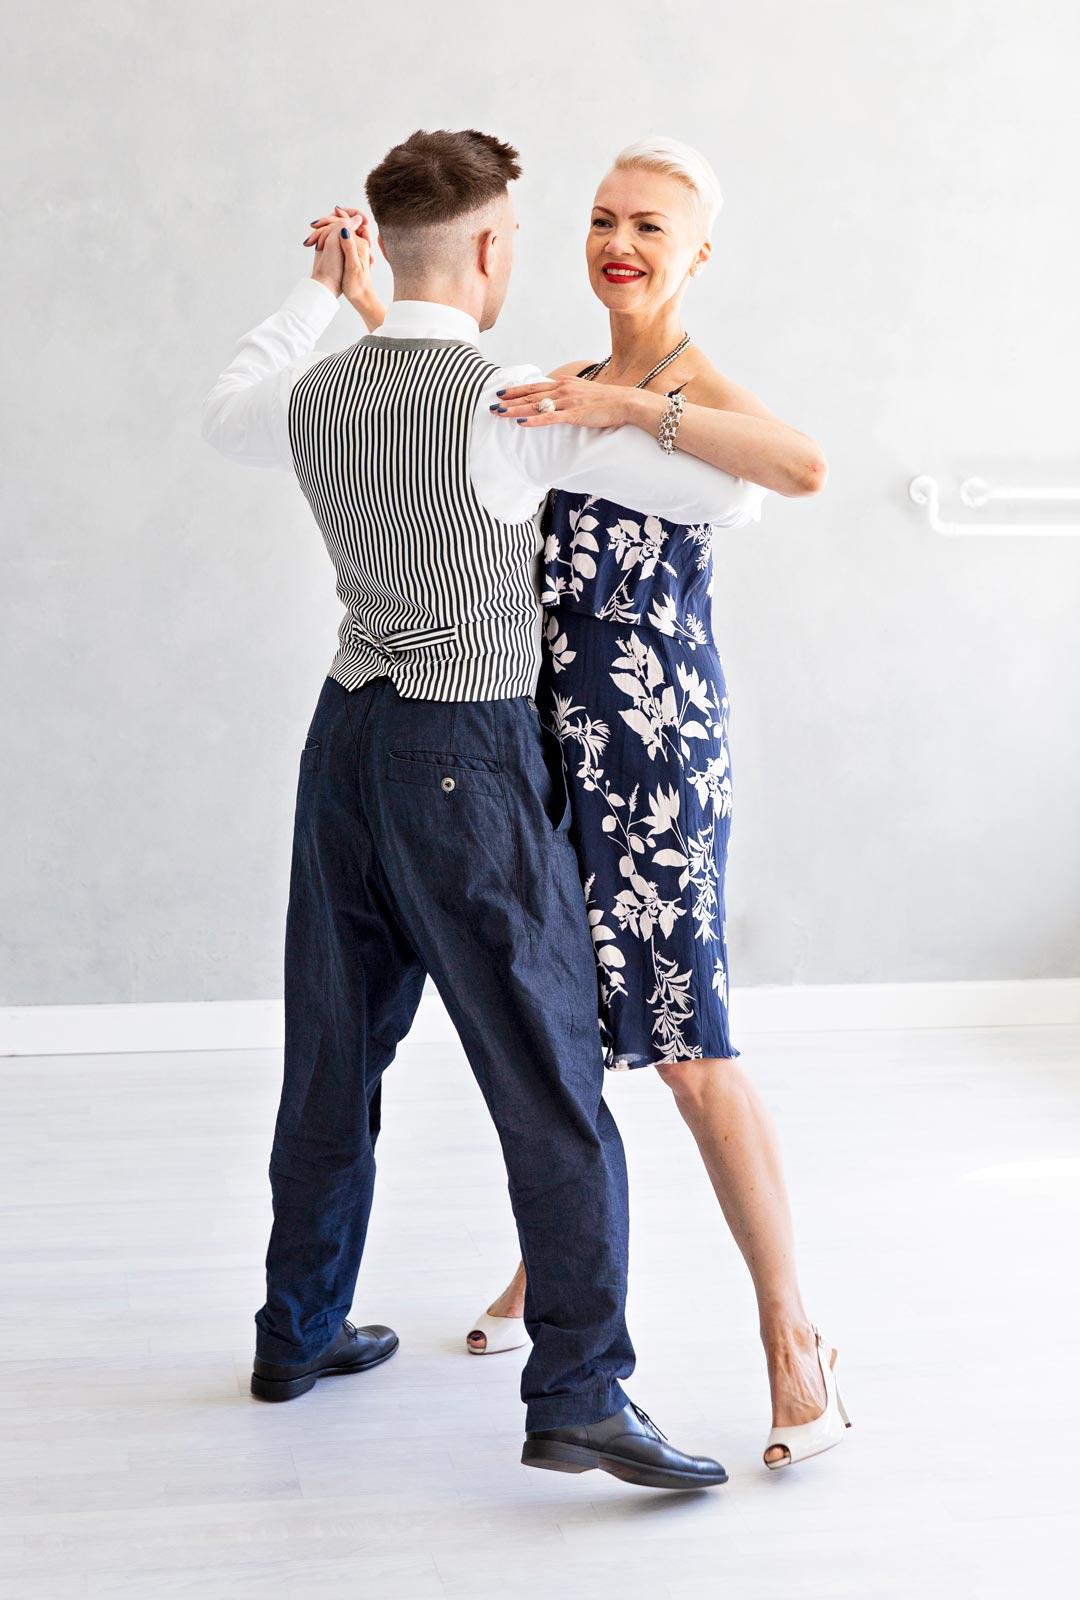 Kolmas tanssiaskel, tango